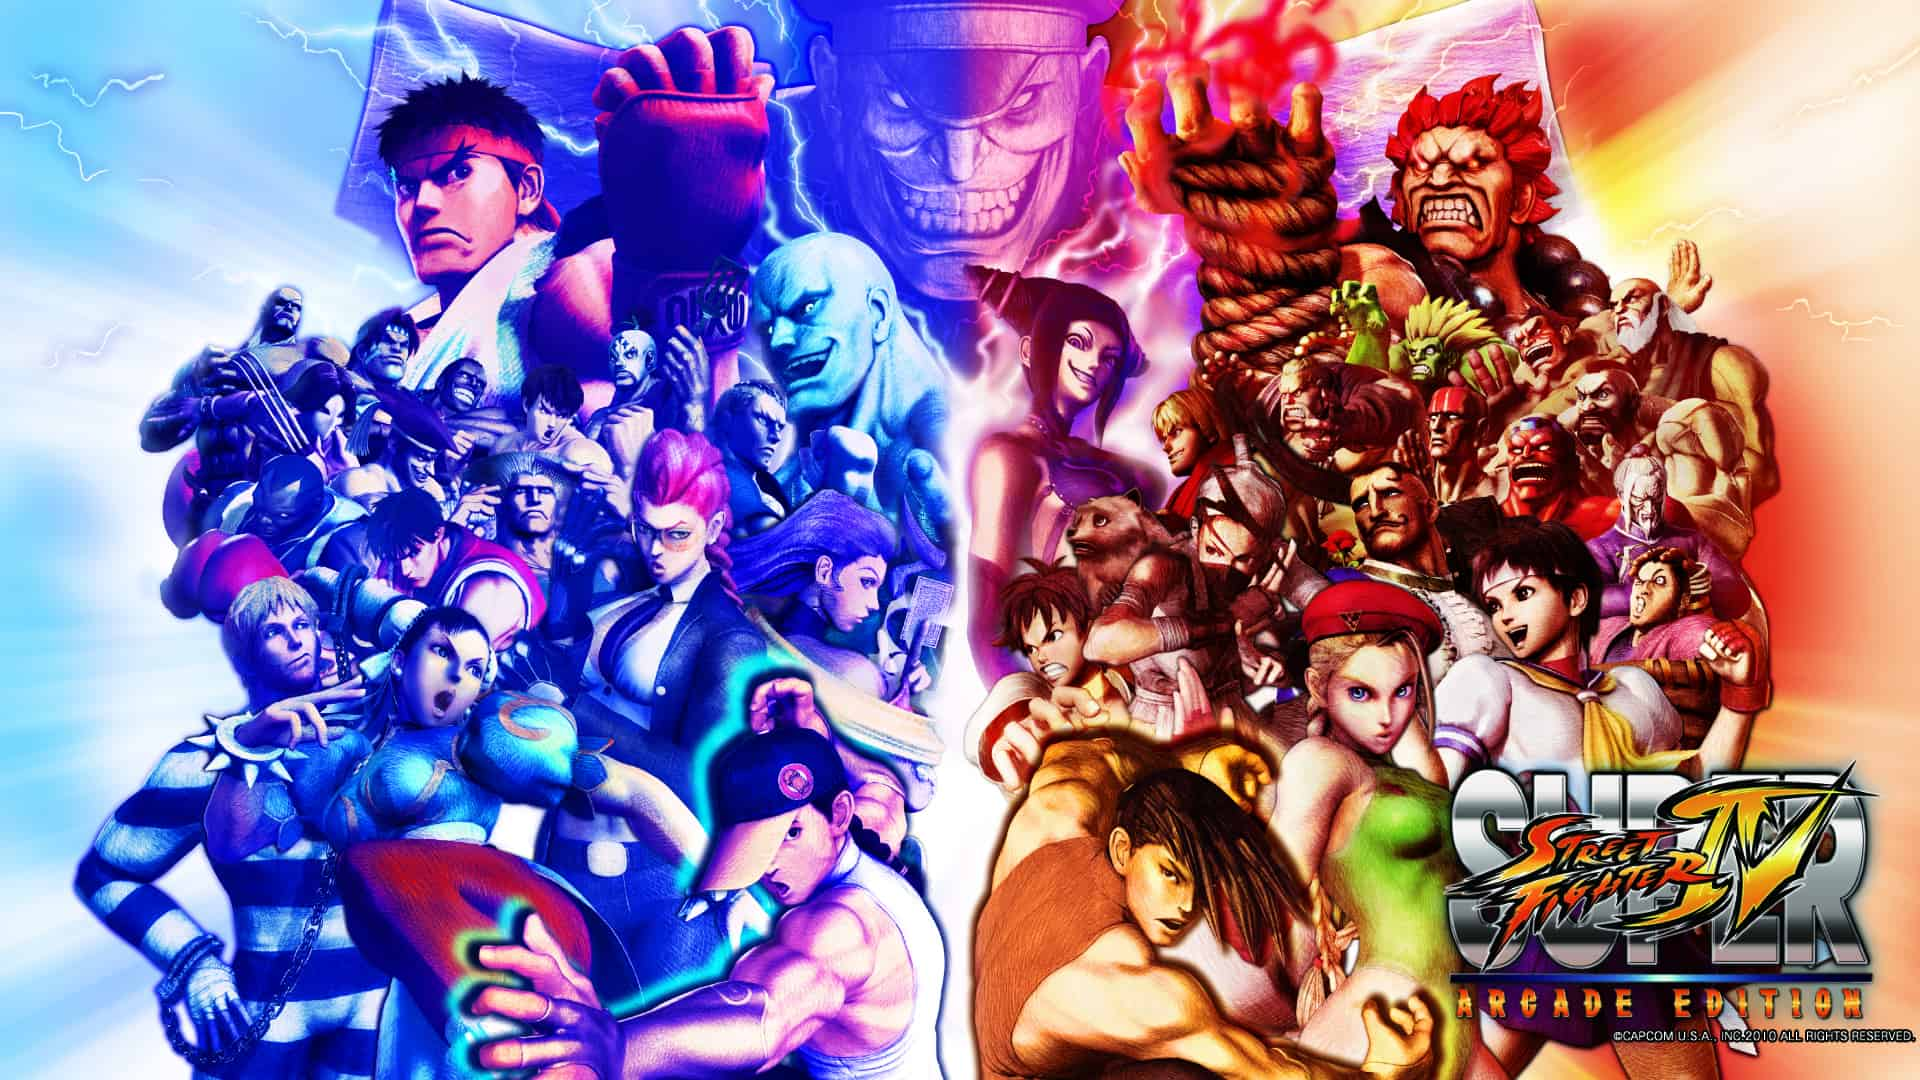 Best Fighting Games - Super Street Fighter IV- Arcade Edition